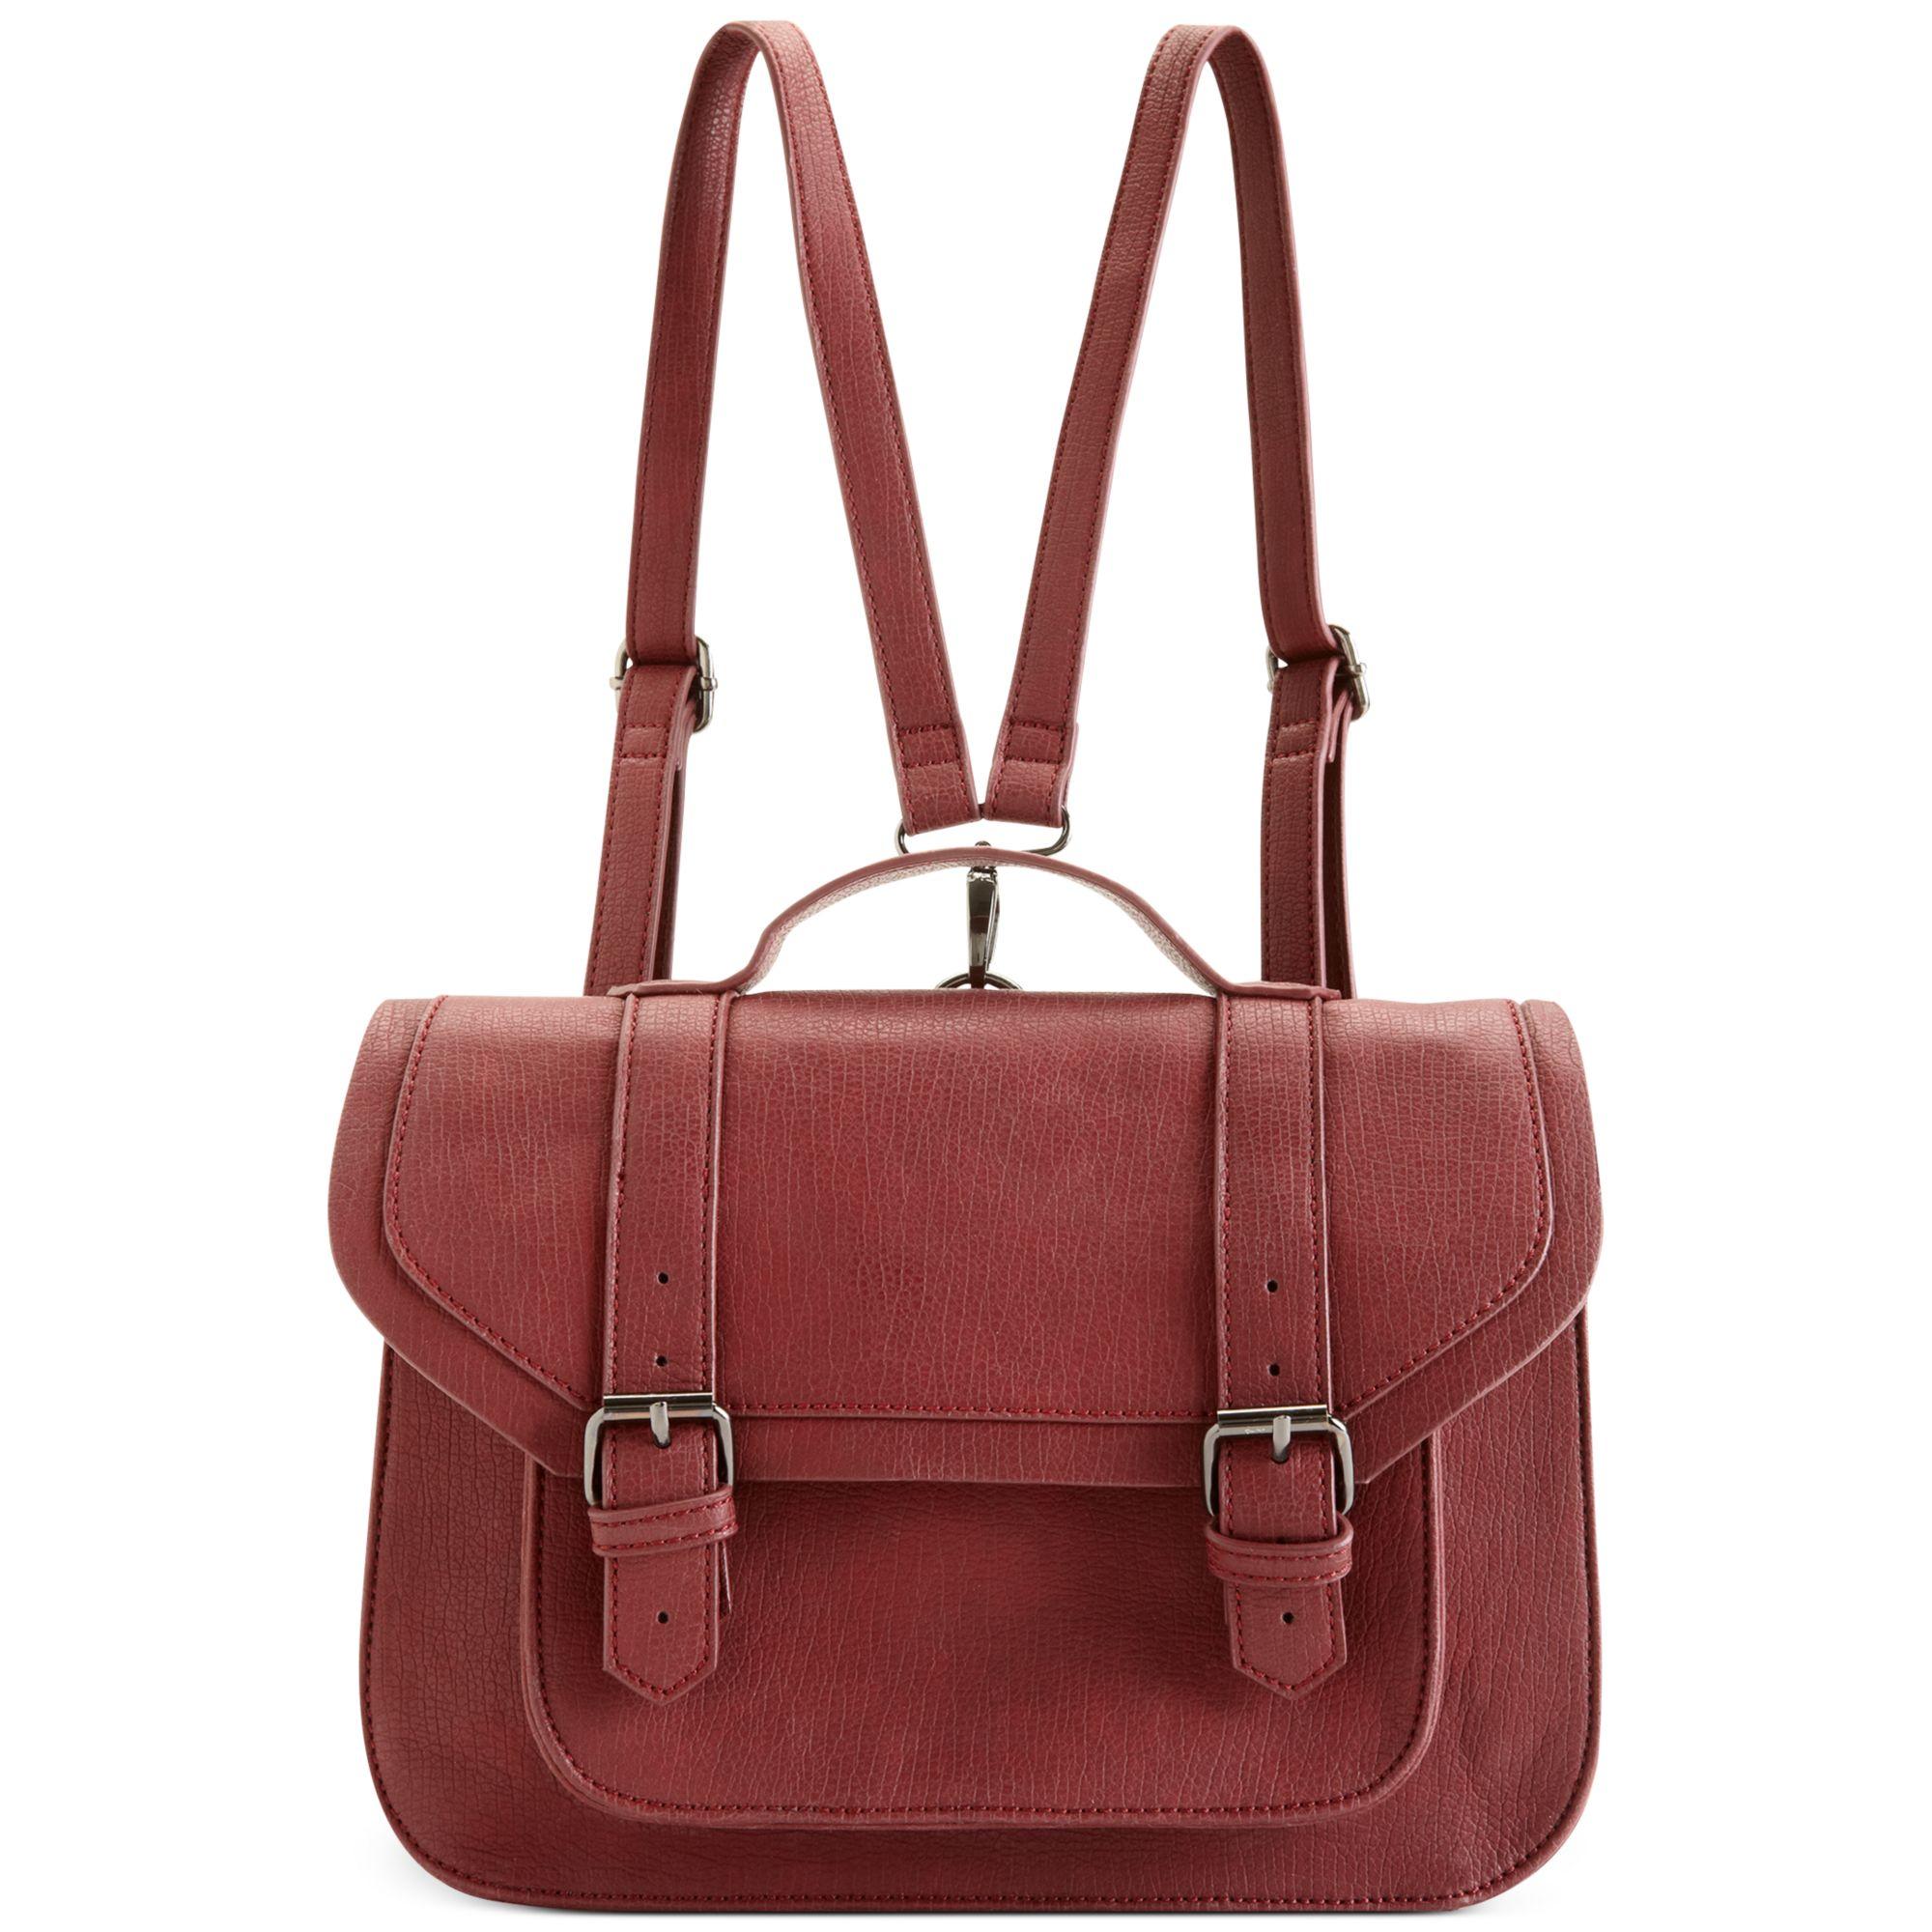 Bcbgeneration Convertible Carmen Le Carine Roitfeld Bag in ...